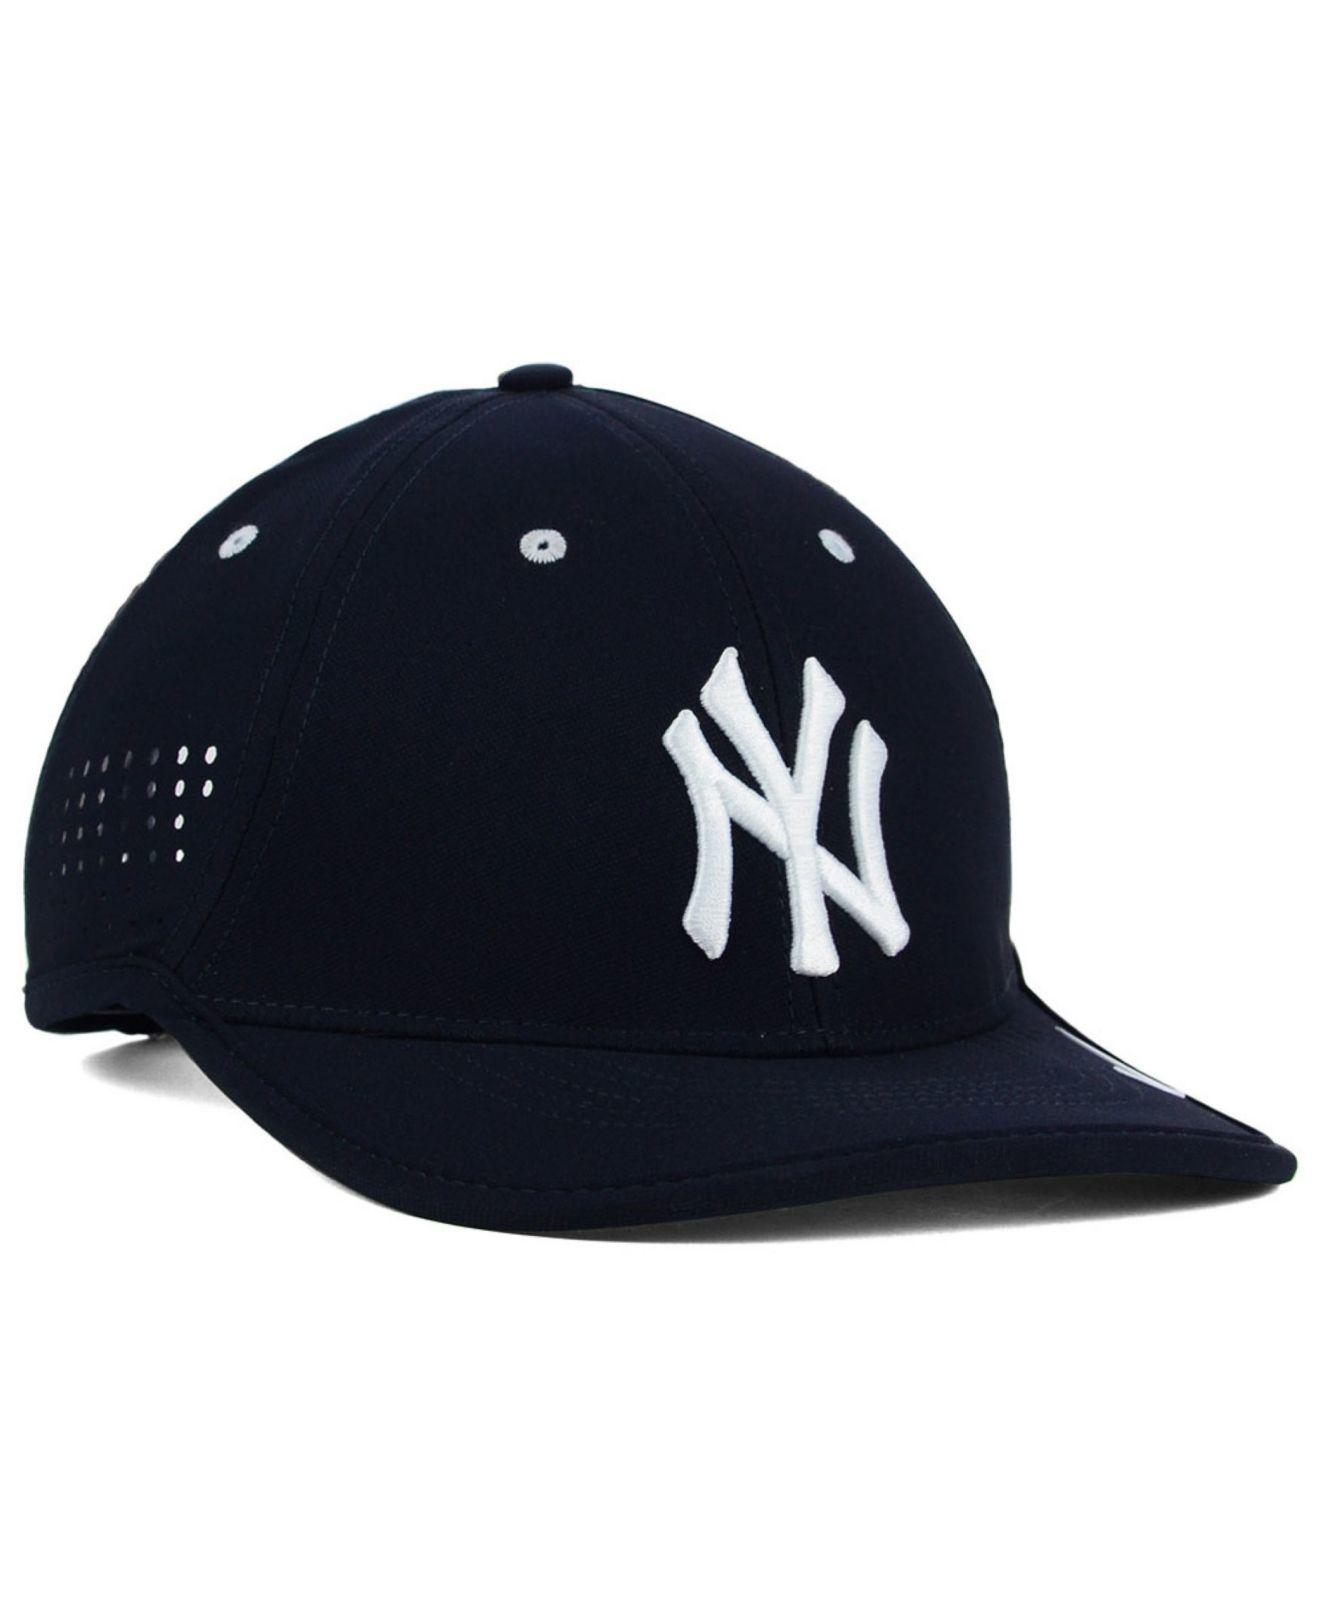 8d5d5842d6253 ... netherlands lyst nike new york yankees vapor swoosh adjustable cap in  blue for men 1b7c7 28f3d